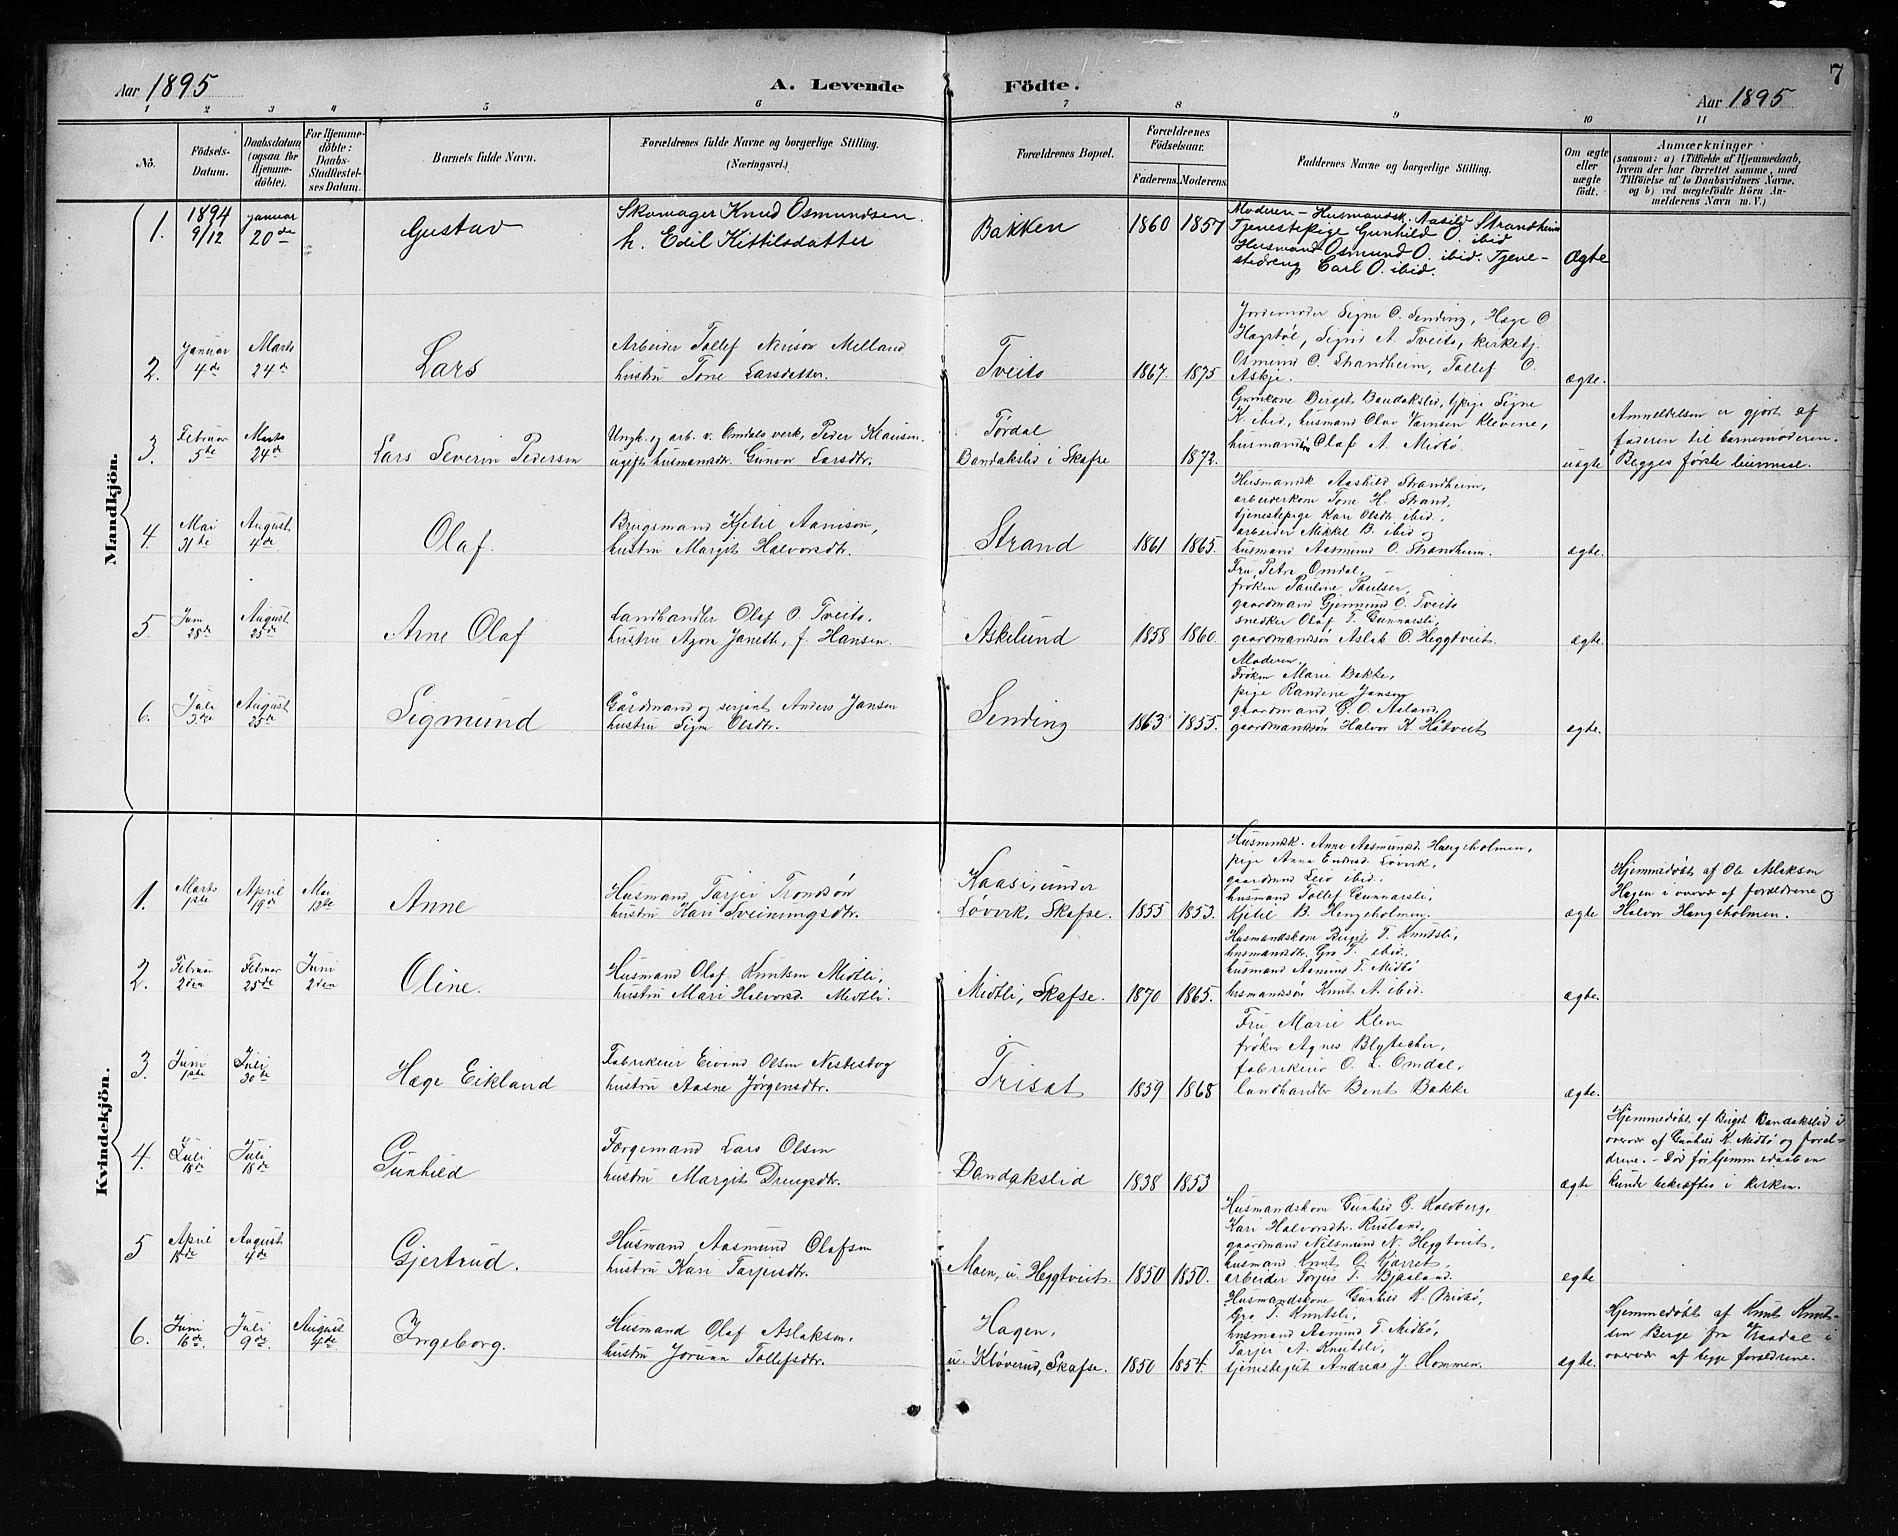 SAKO, Lårdal kirkebøker, G/Ga/L0003: Klokkerbok nr. I 3, 1891-1918, s. 7